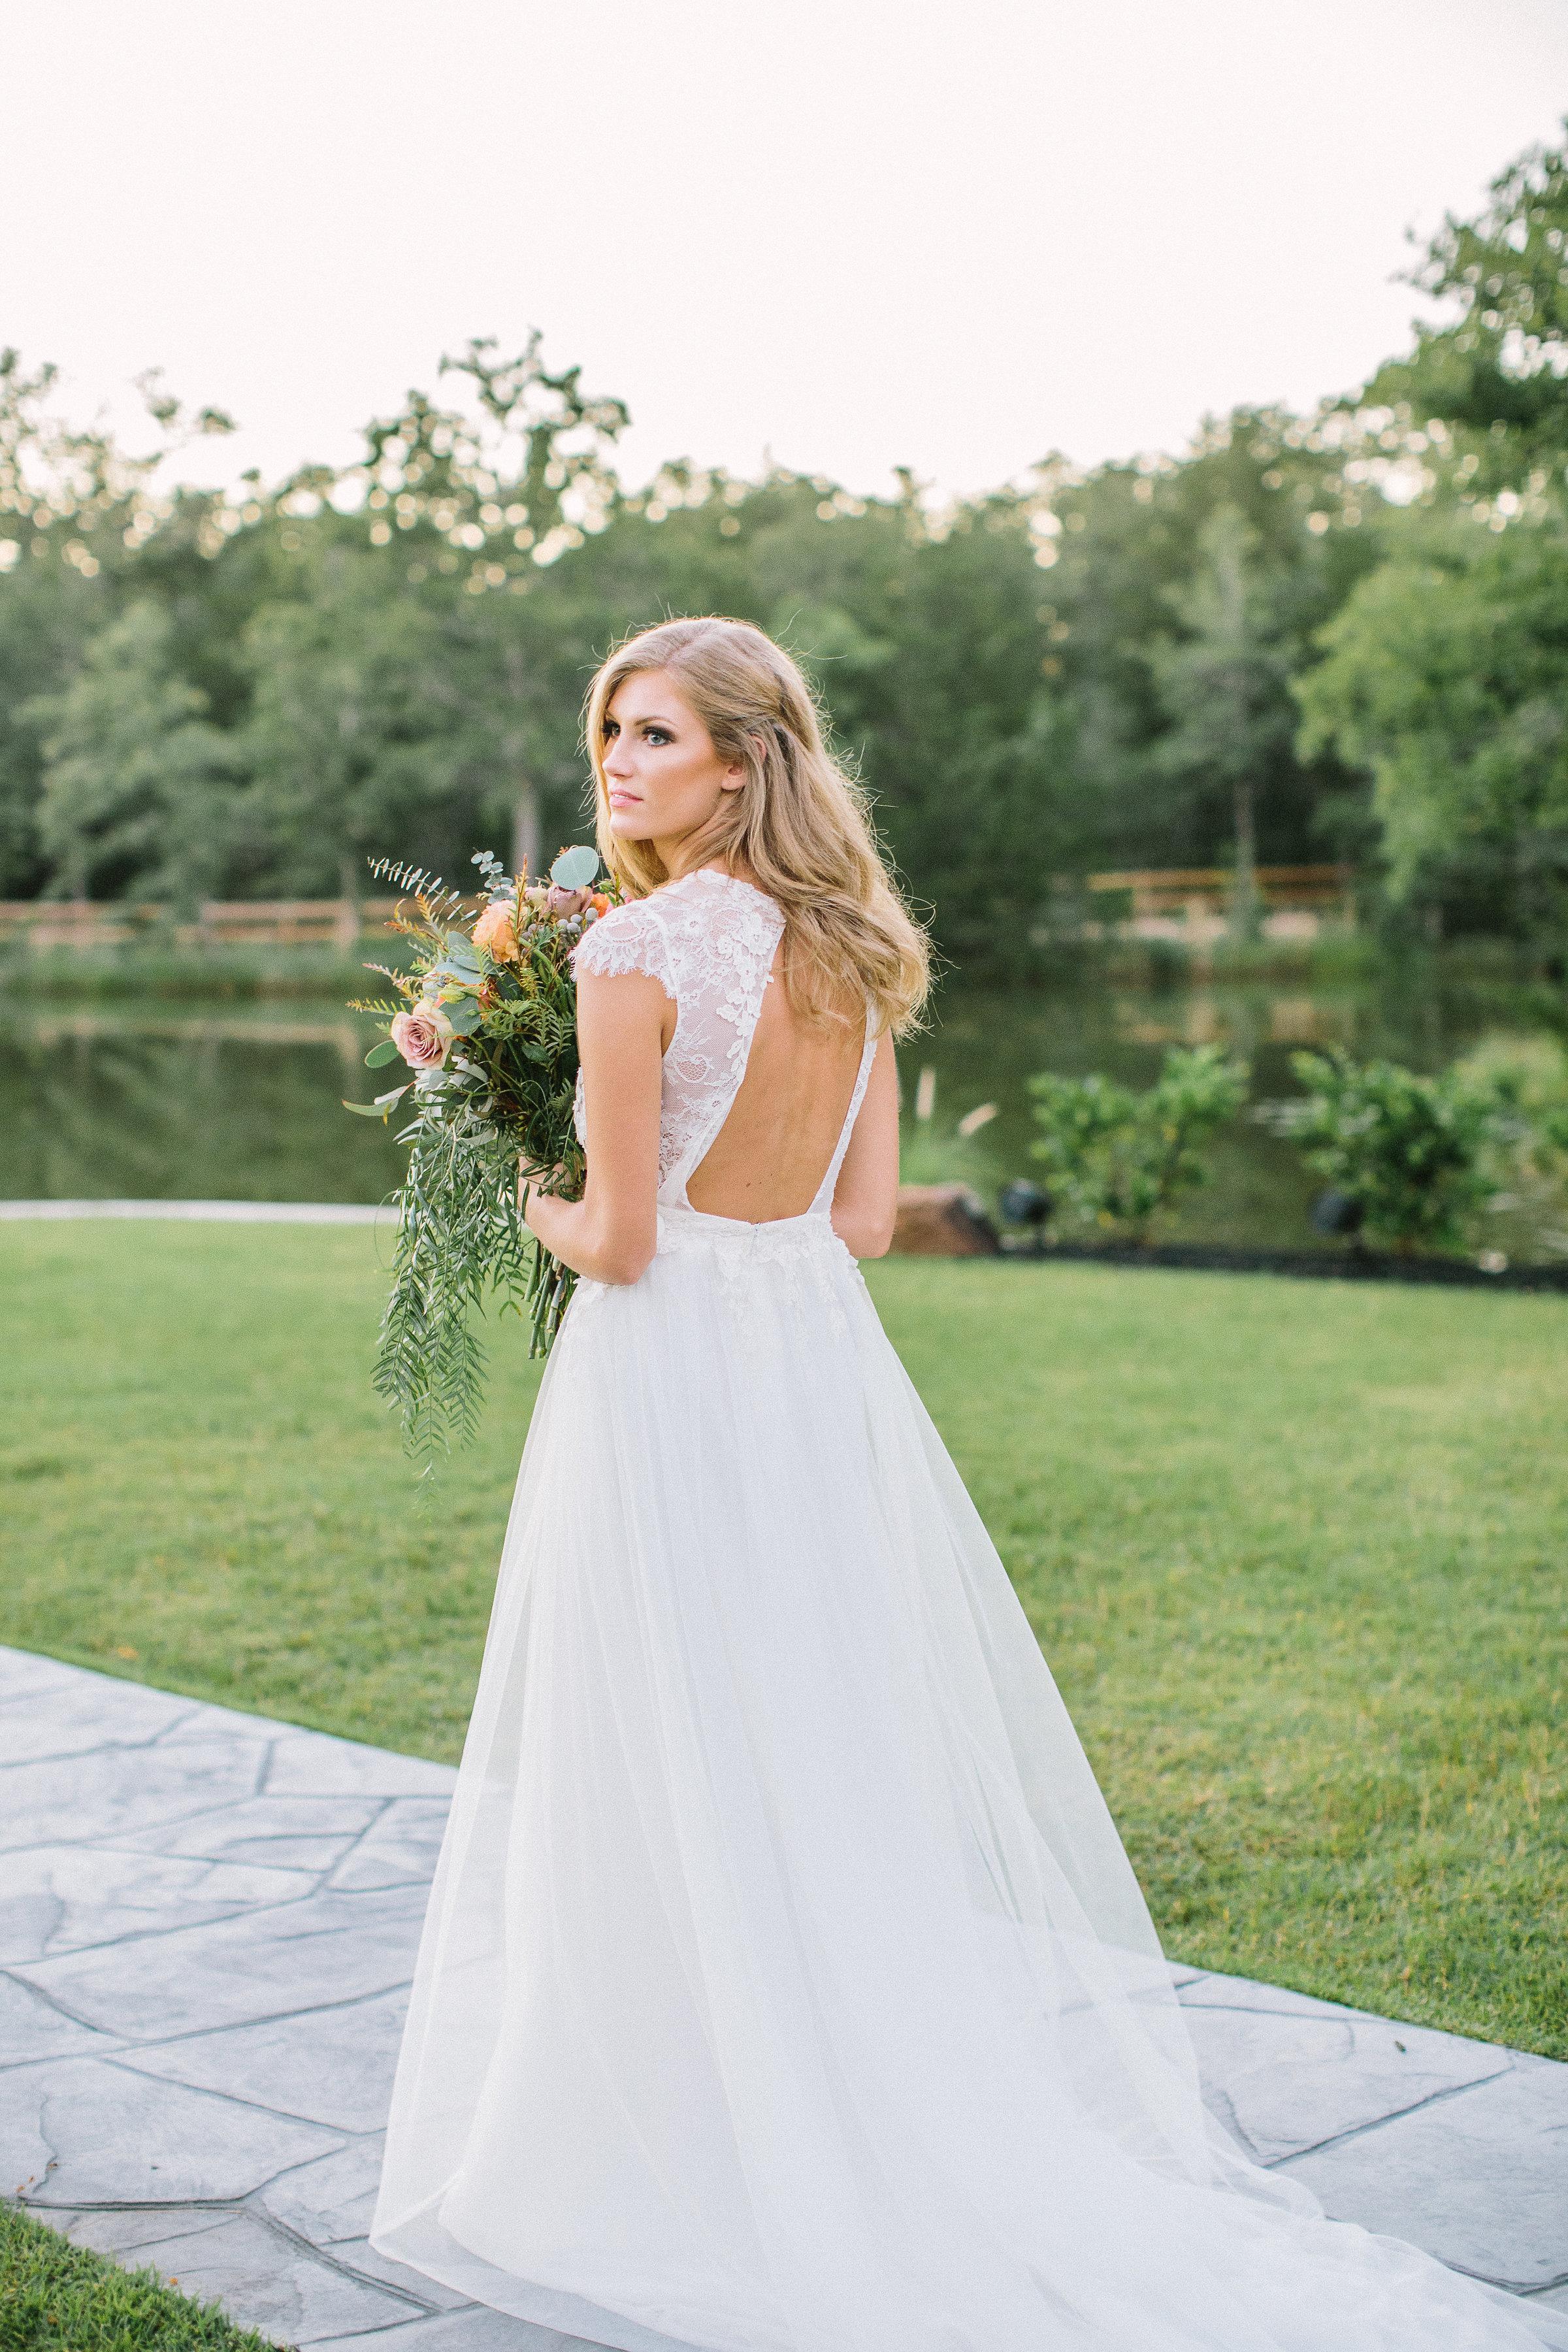 Ellen-Ashton-Photography-Peach-Creek-Ranch-Weddings-Wed-and-Prosper388